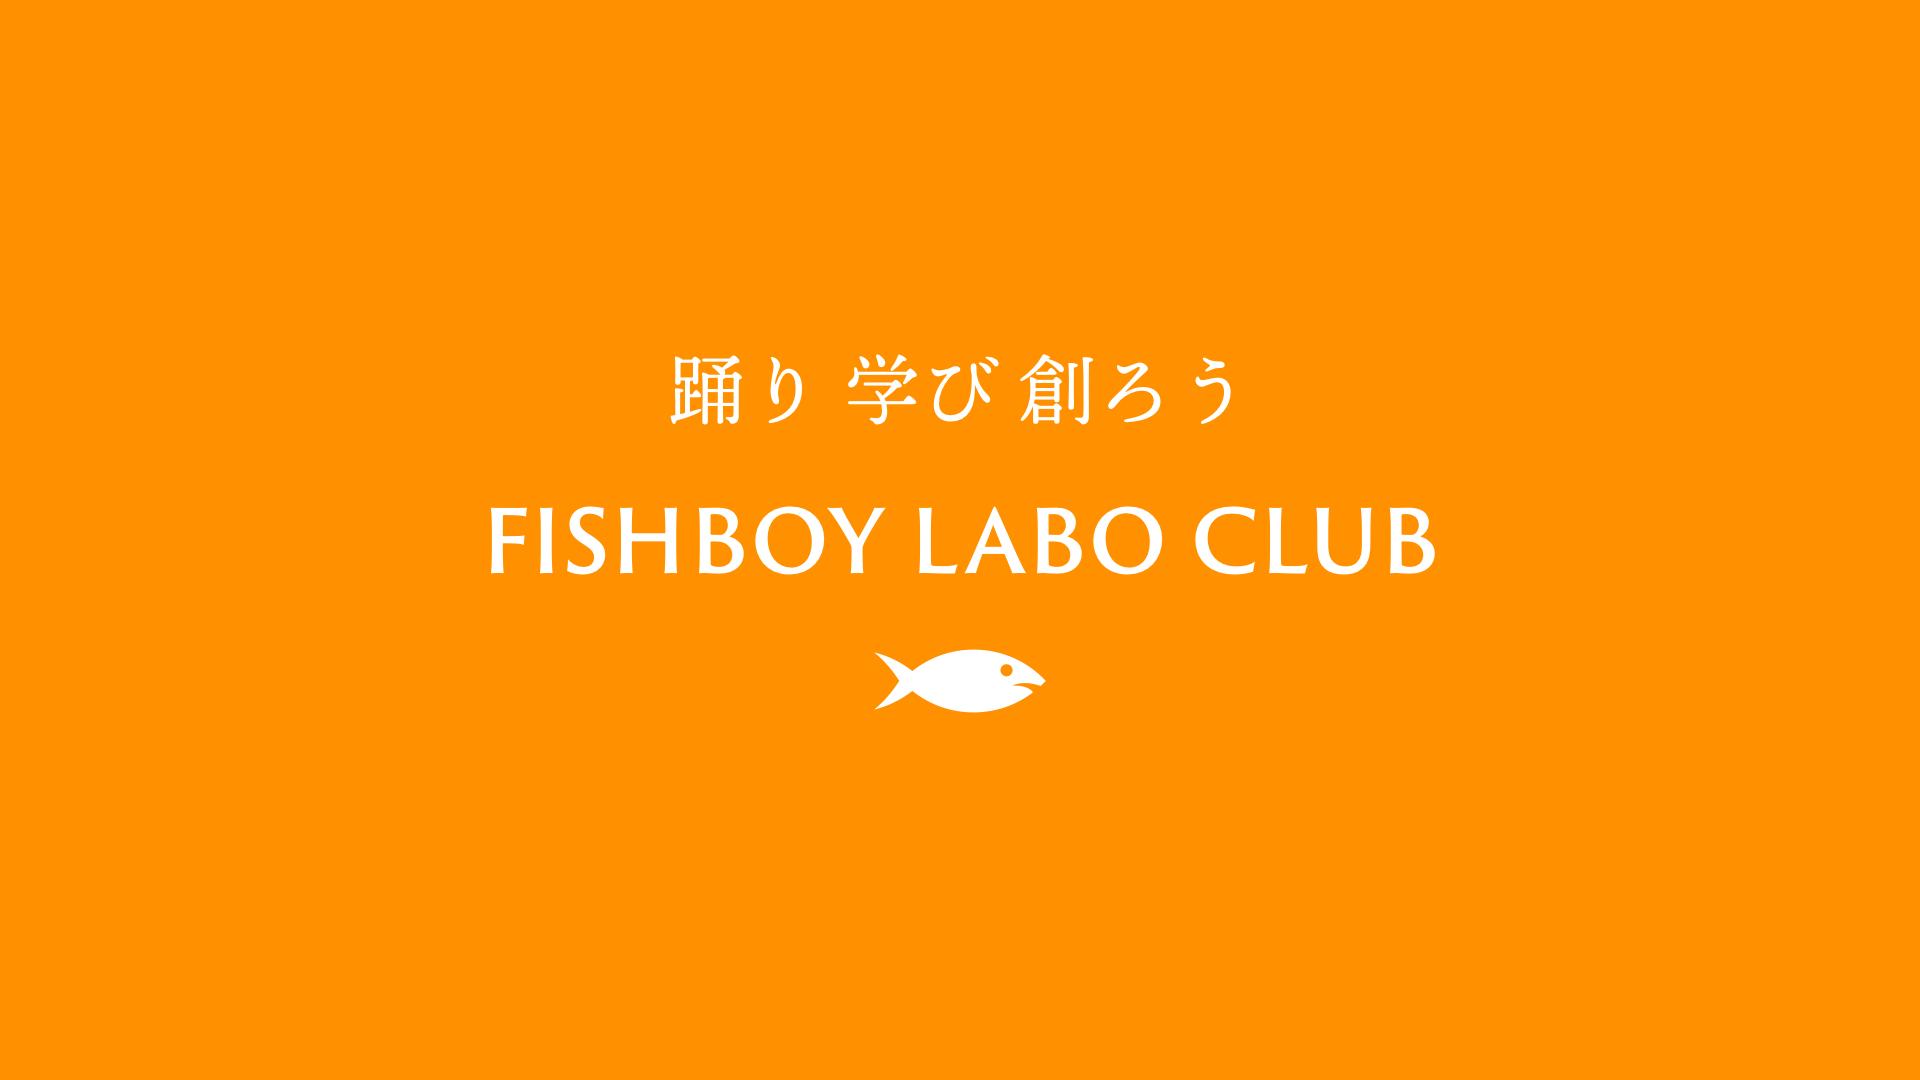 FISHBOY LABO CLUB